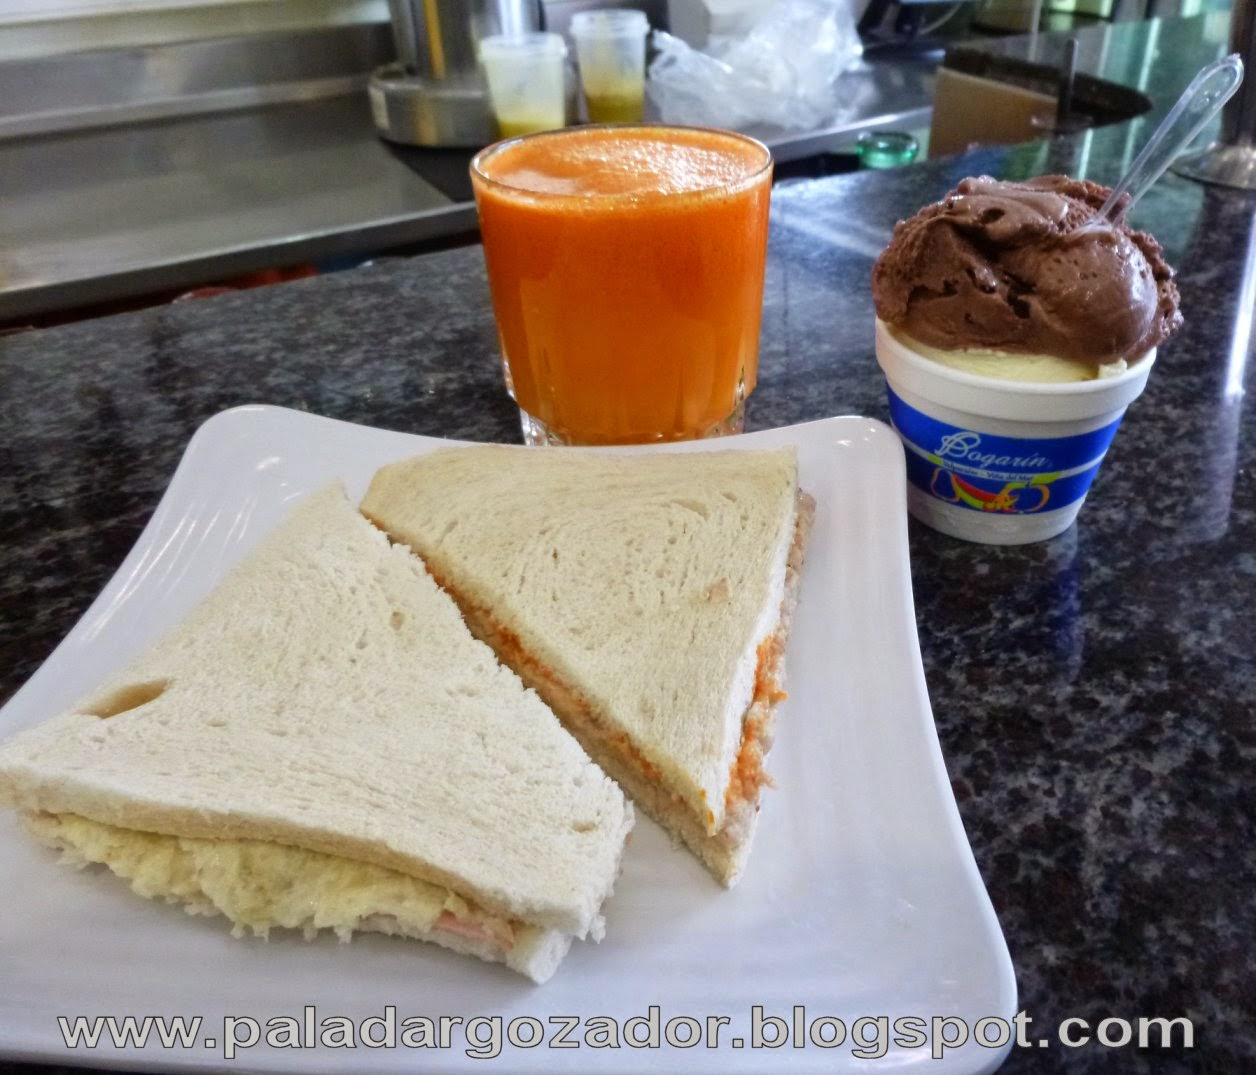 Bogarin Valparaiso Sandwich jugo helado